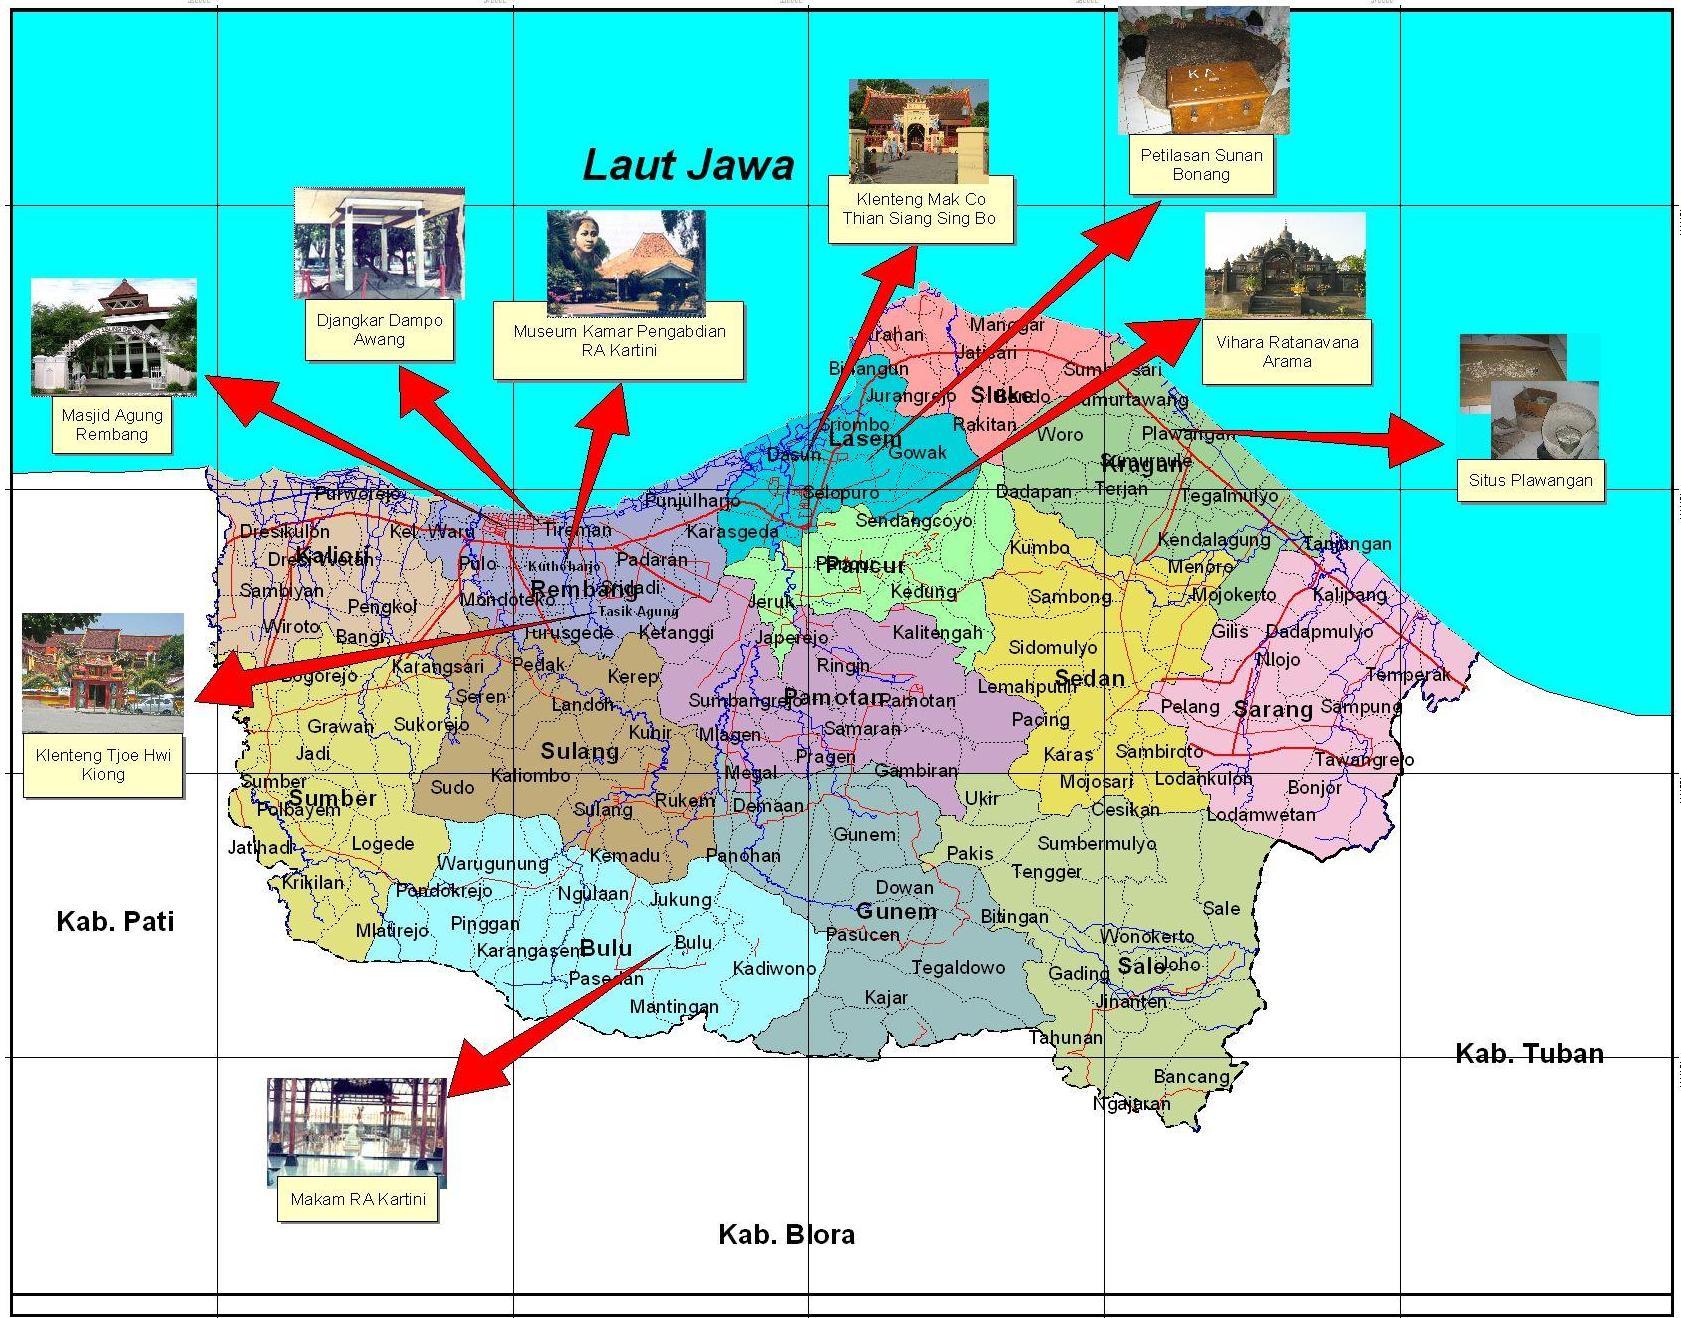 Peta Rembang Berita Wisata Kabupaten Pantai Caruban Lasem Kab